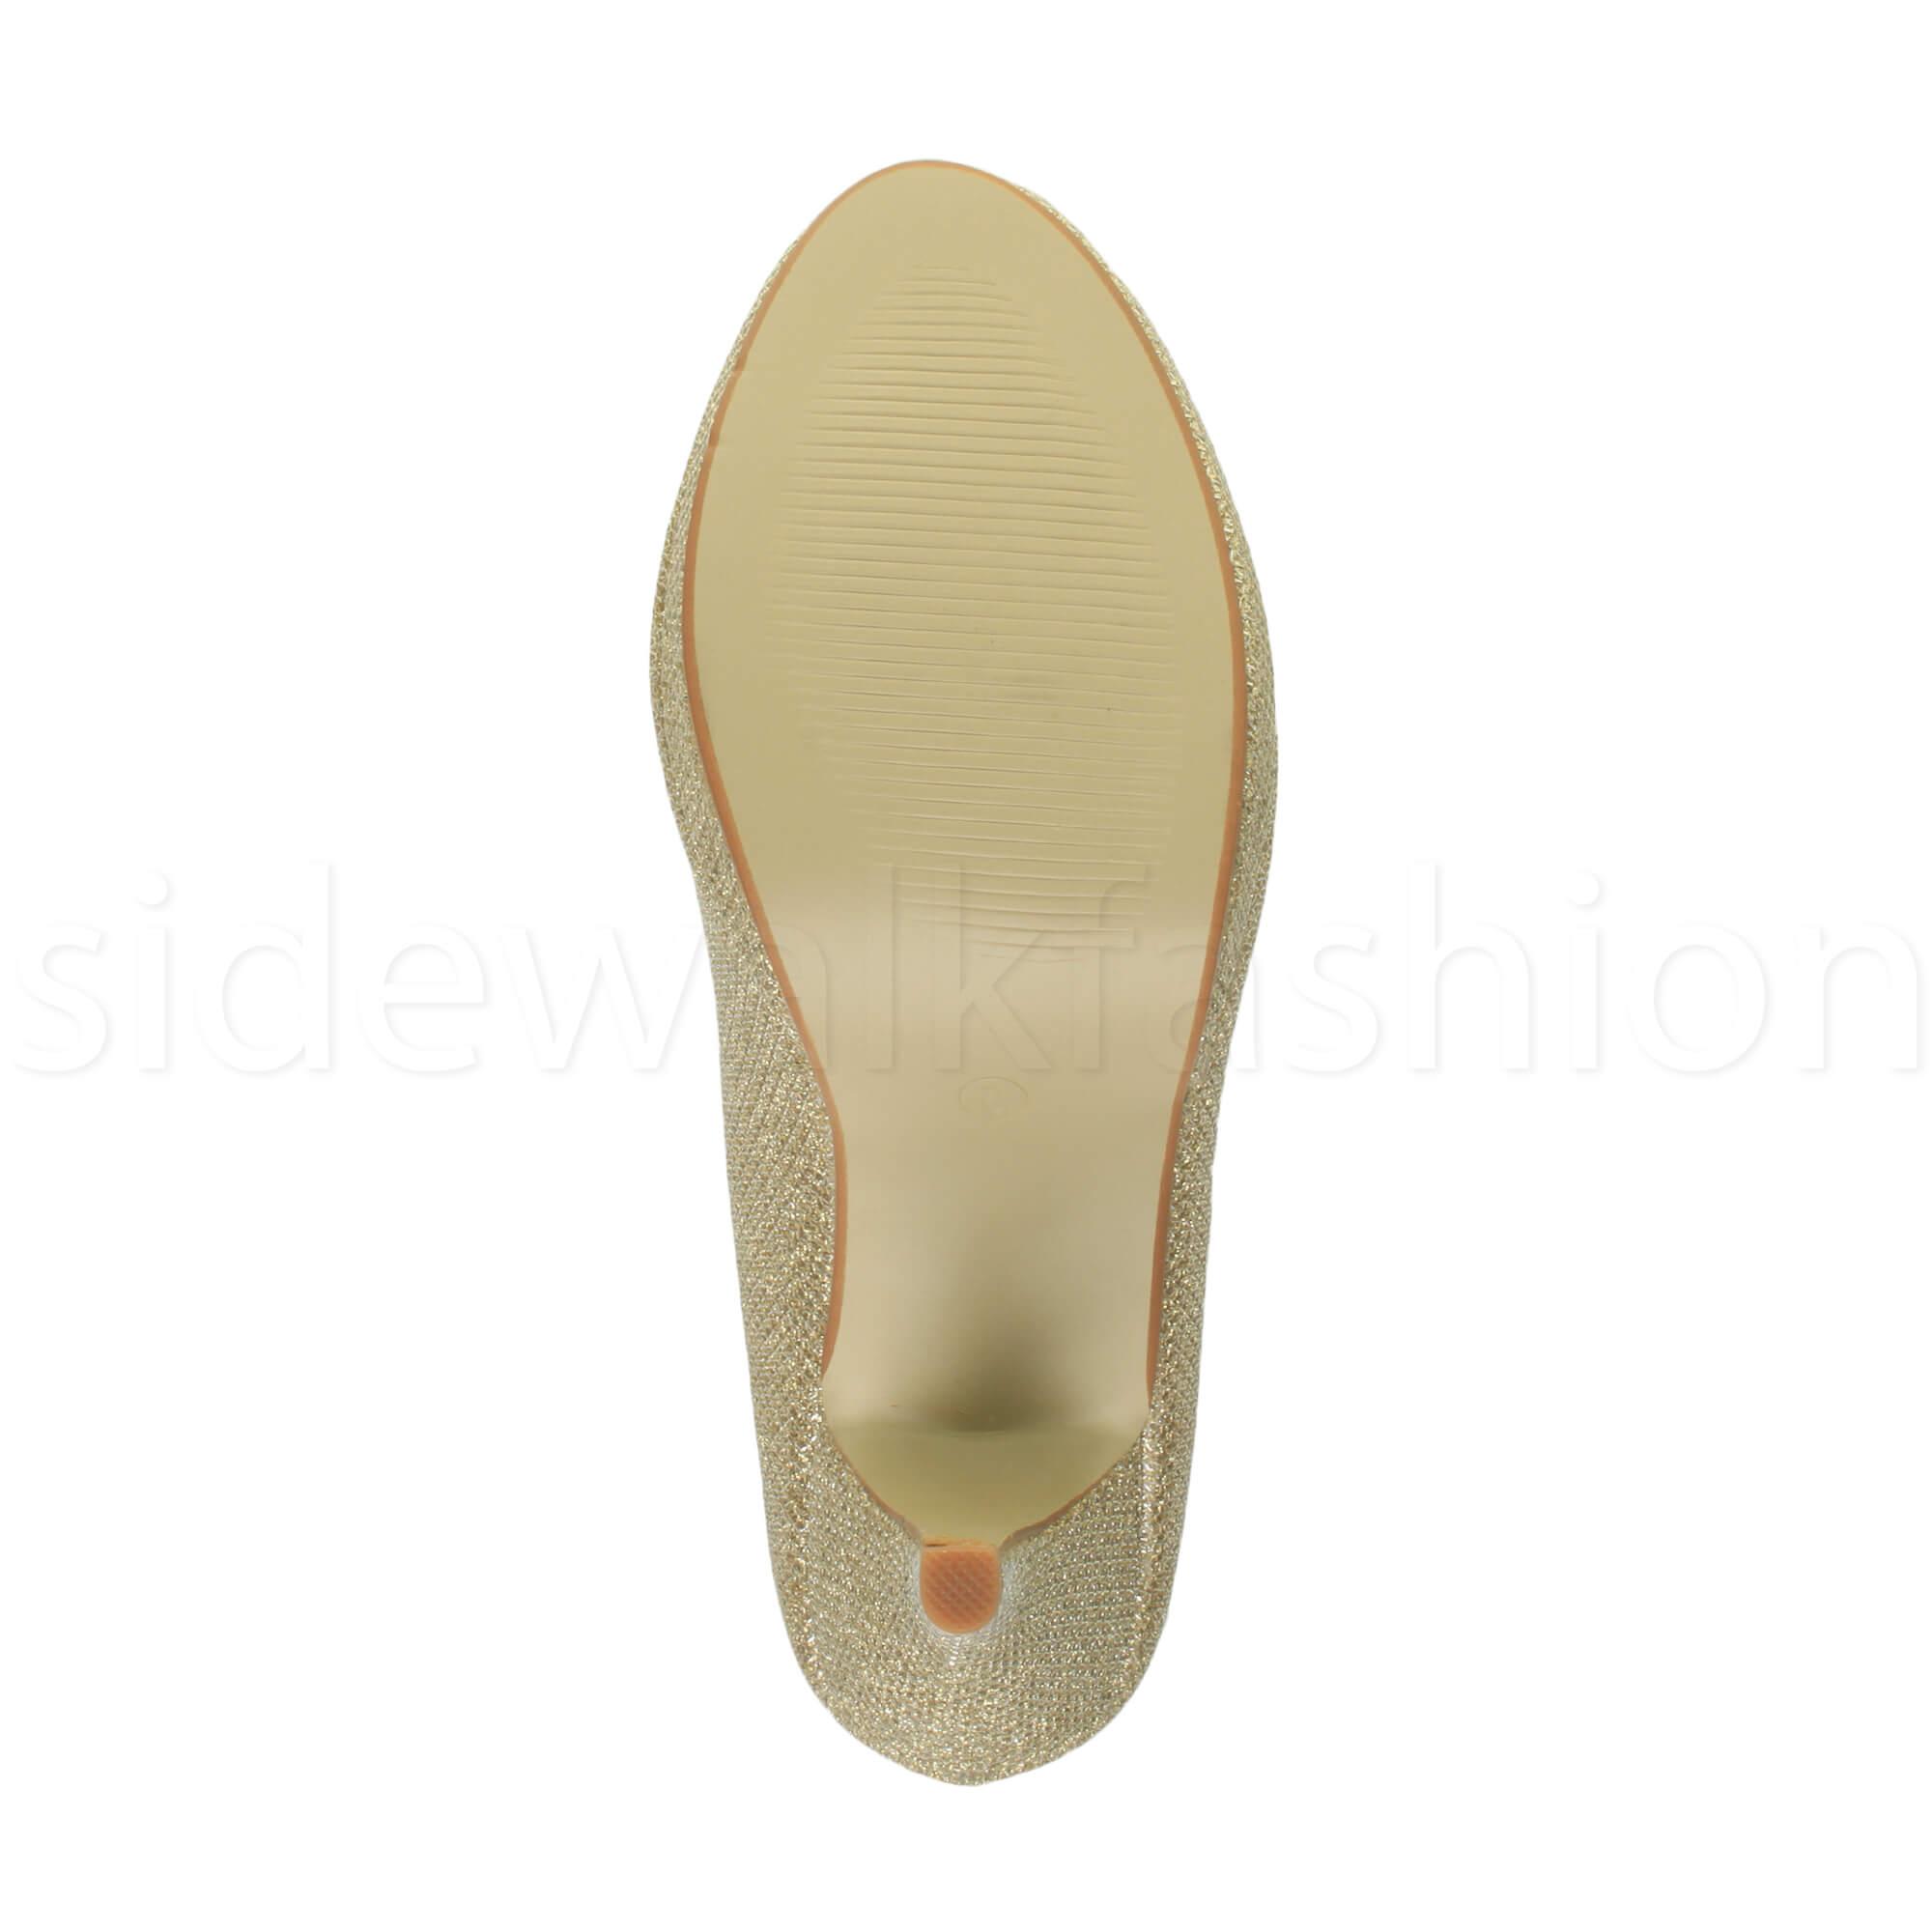 Womens-ladies-high-mid-heel-platform-wedding-evening-bridesmaid-court-shoes-size thumbnail 71